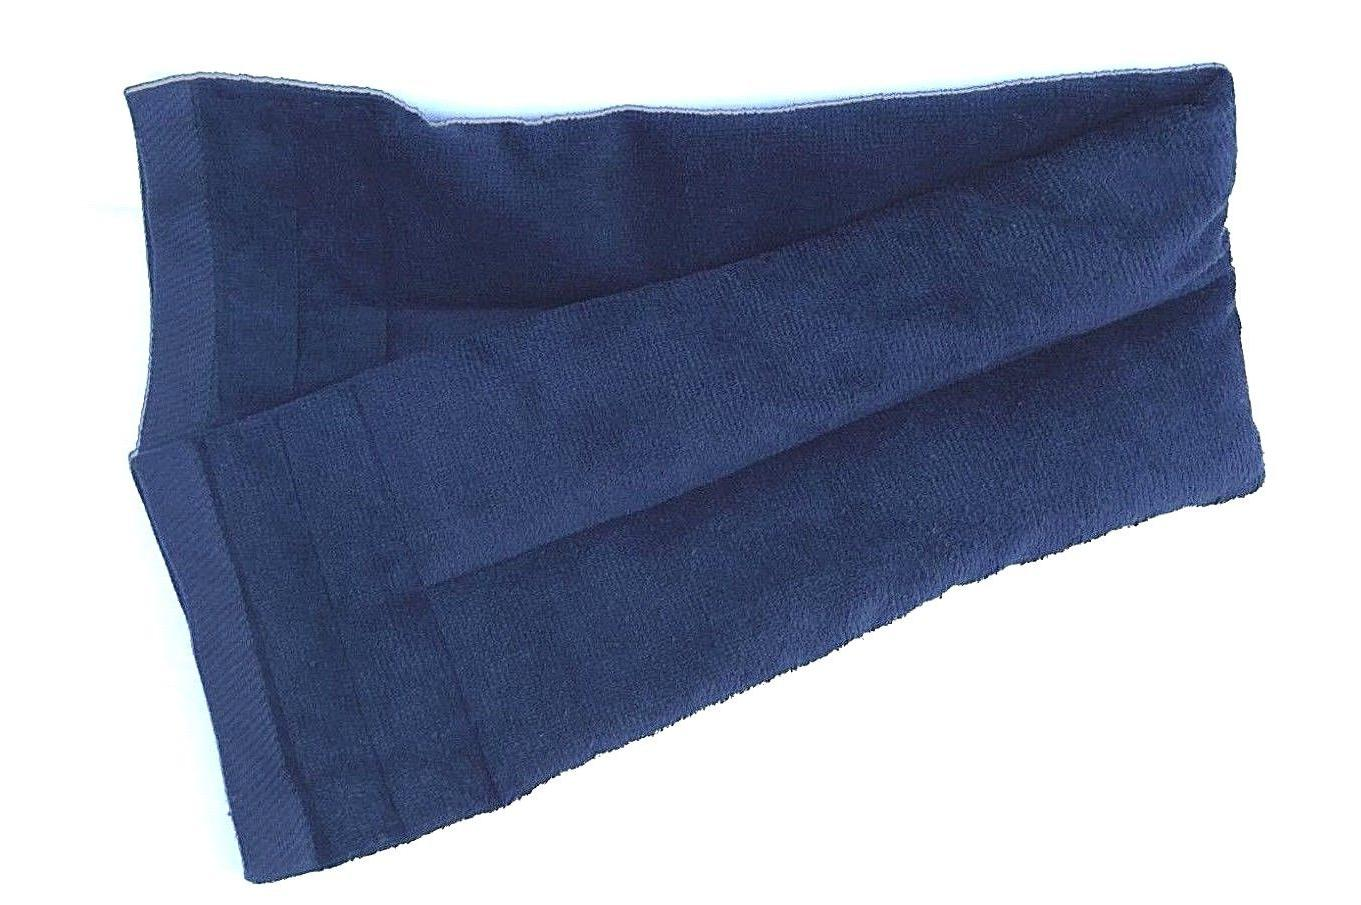 Heat Pack, Neck Wrap, Microwave Heating Pad, Rice Bag, Plush